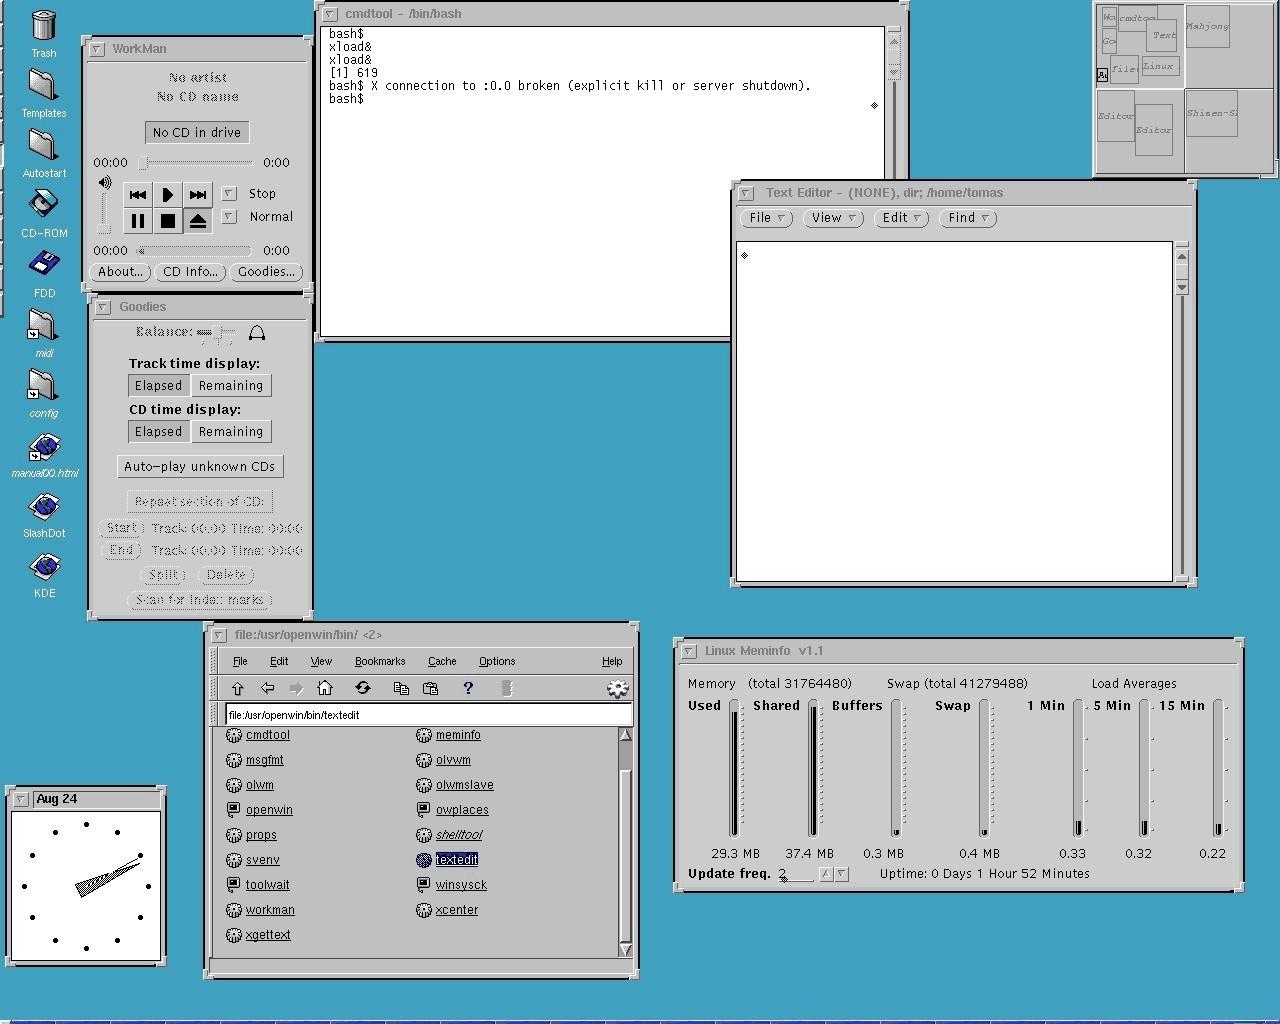 Olvwm Screens Ktheme_openlook_small Jpg A Theme Which Looks Similiar To Olvwm Screens Ktheme_blue 0 1 Tgz A Theme For Kde Ktheme_blue_big Jpg